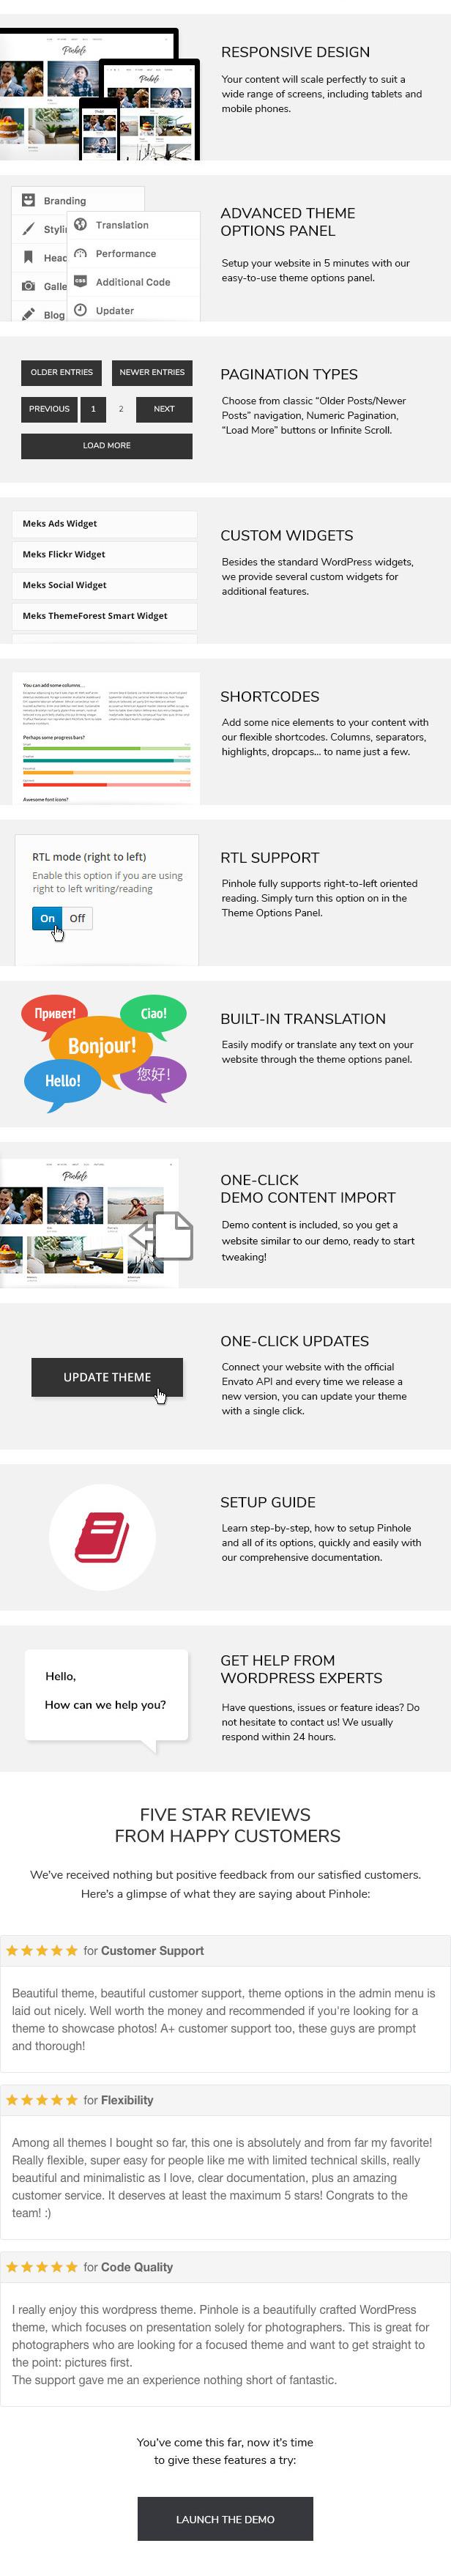 Pinhole - WordPress Gallery Theme for Photographers